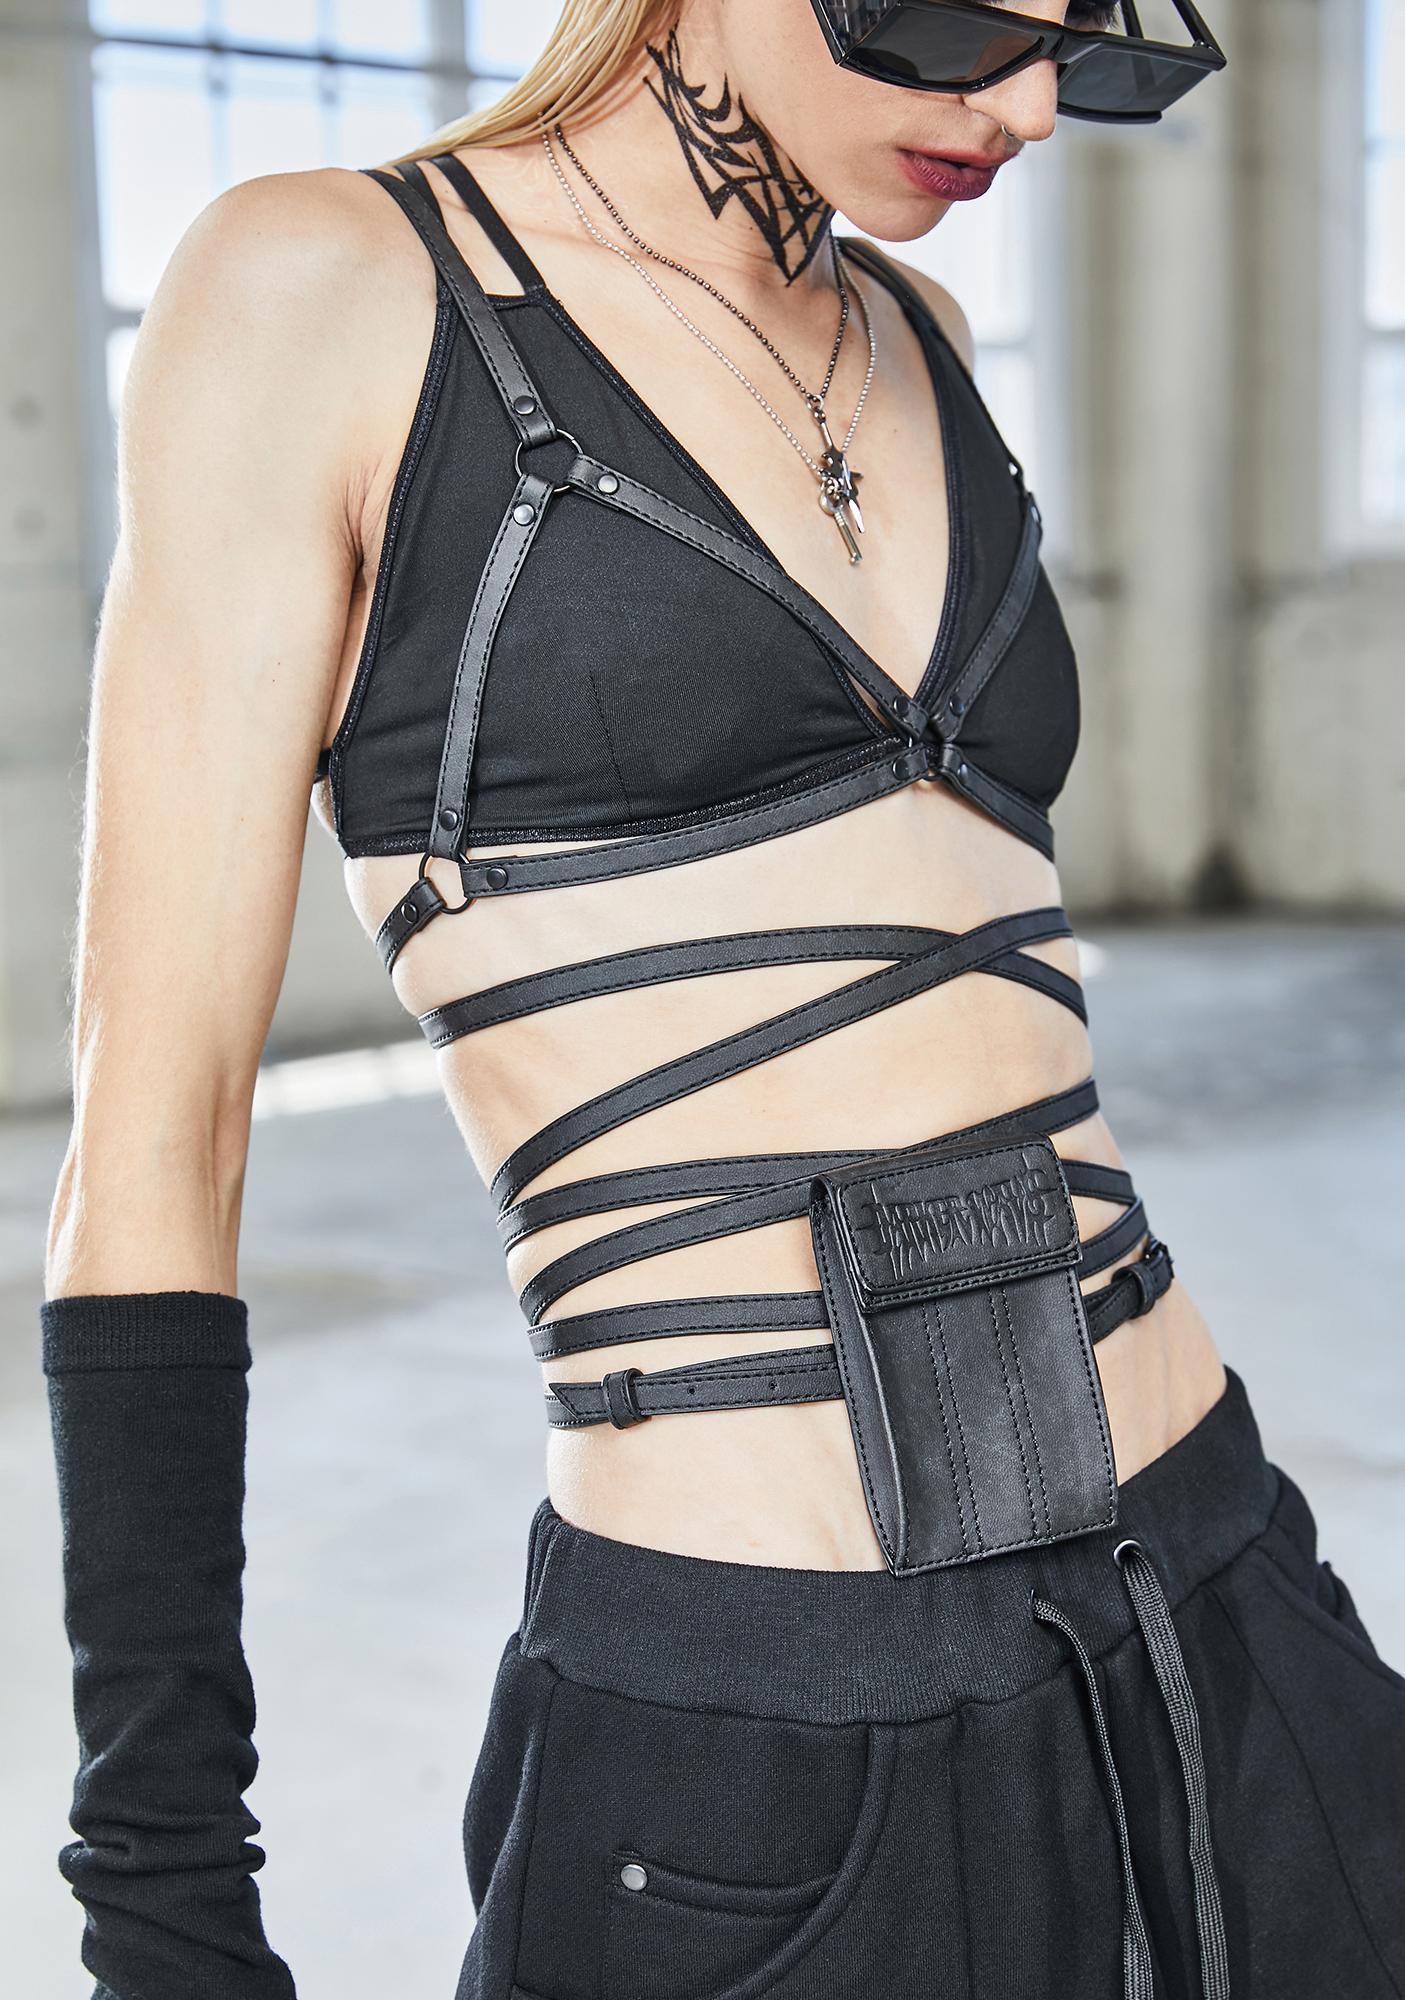 DARKER WAVS Bassline Pocket Harness Bra